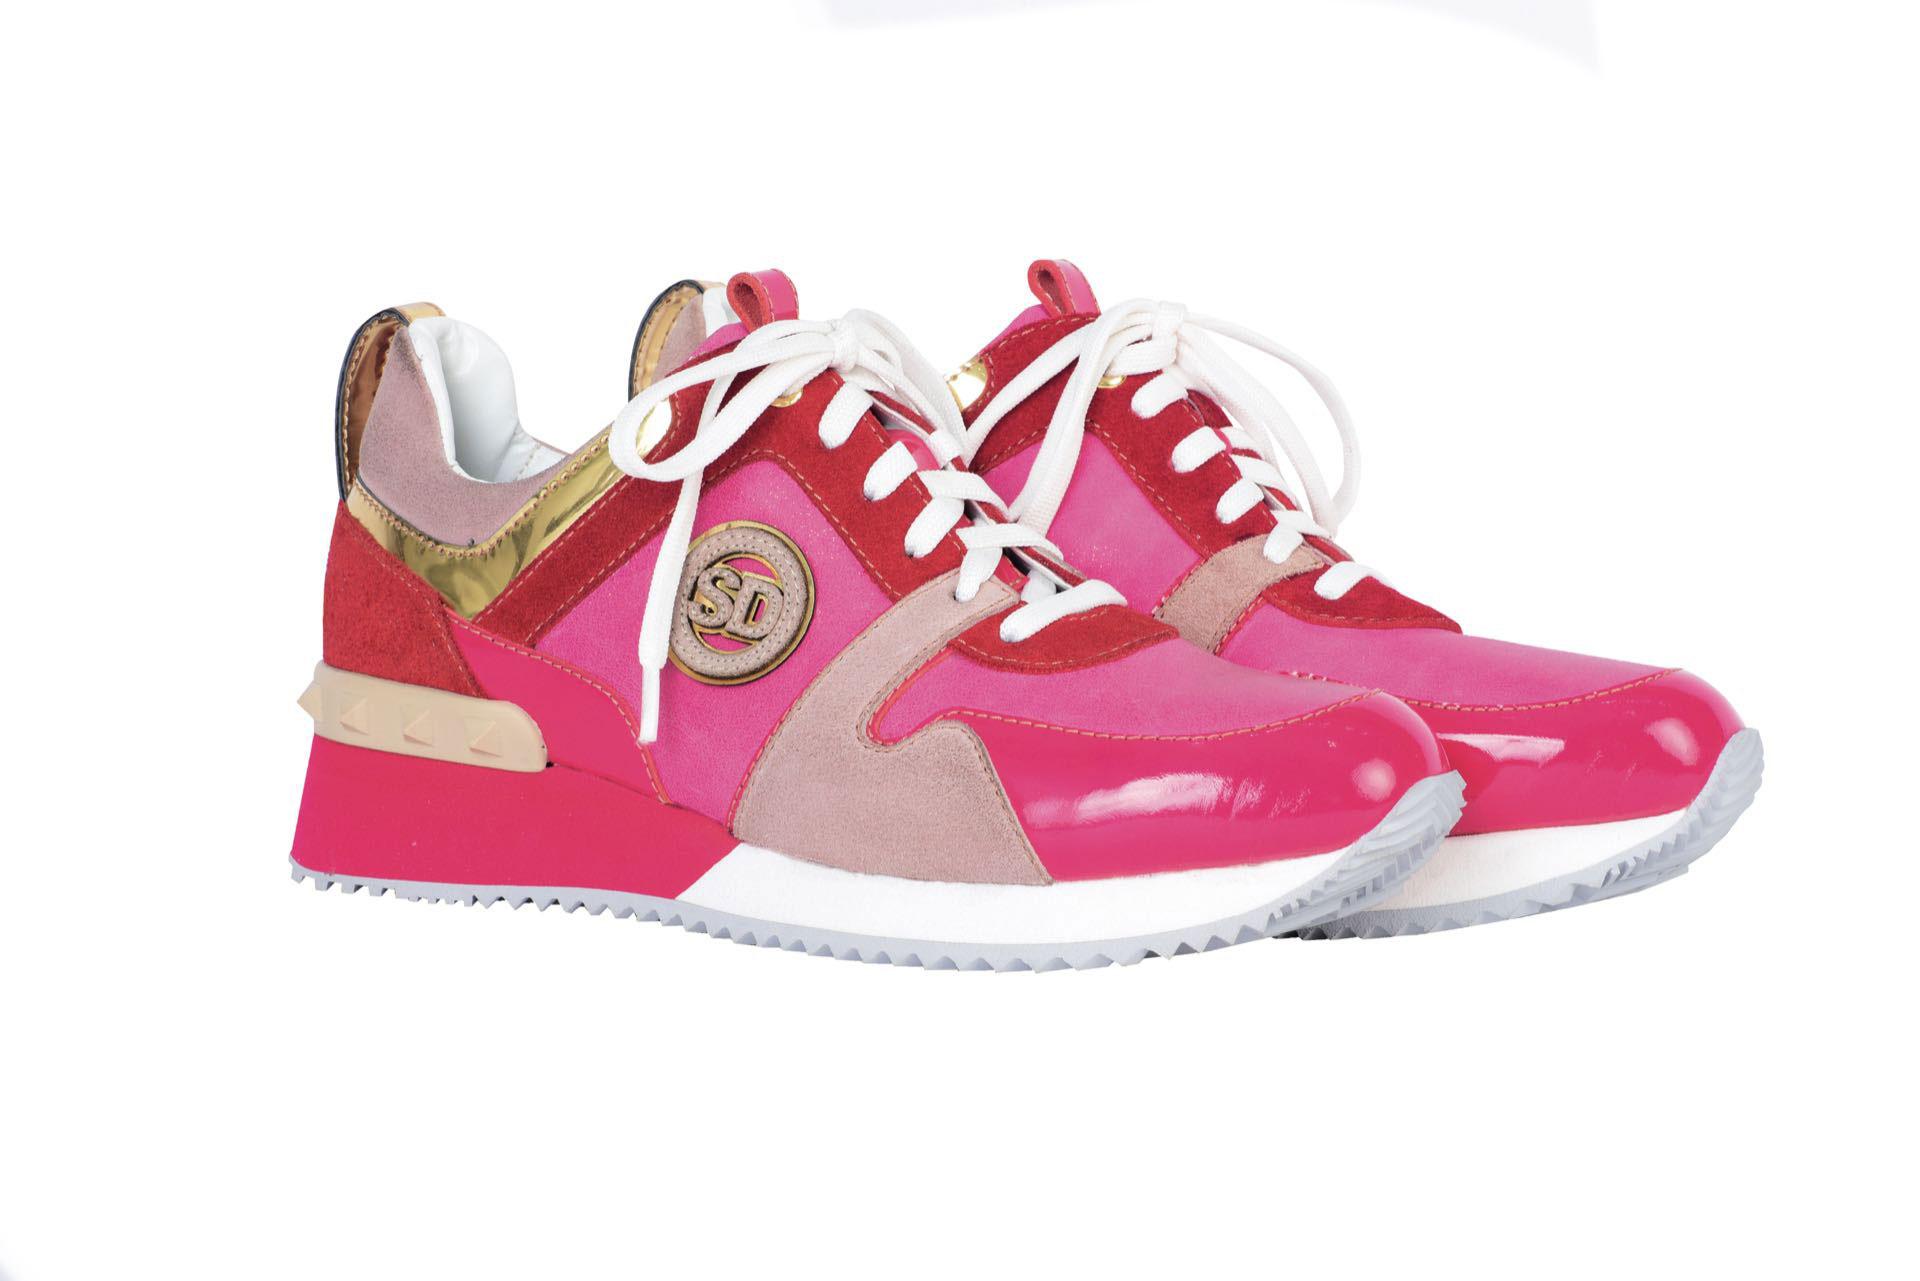 Zapatillas combinadas ($ 4.500, Saverio di Ricci).